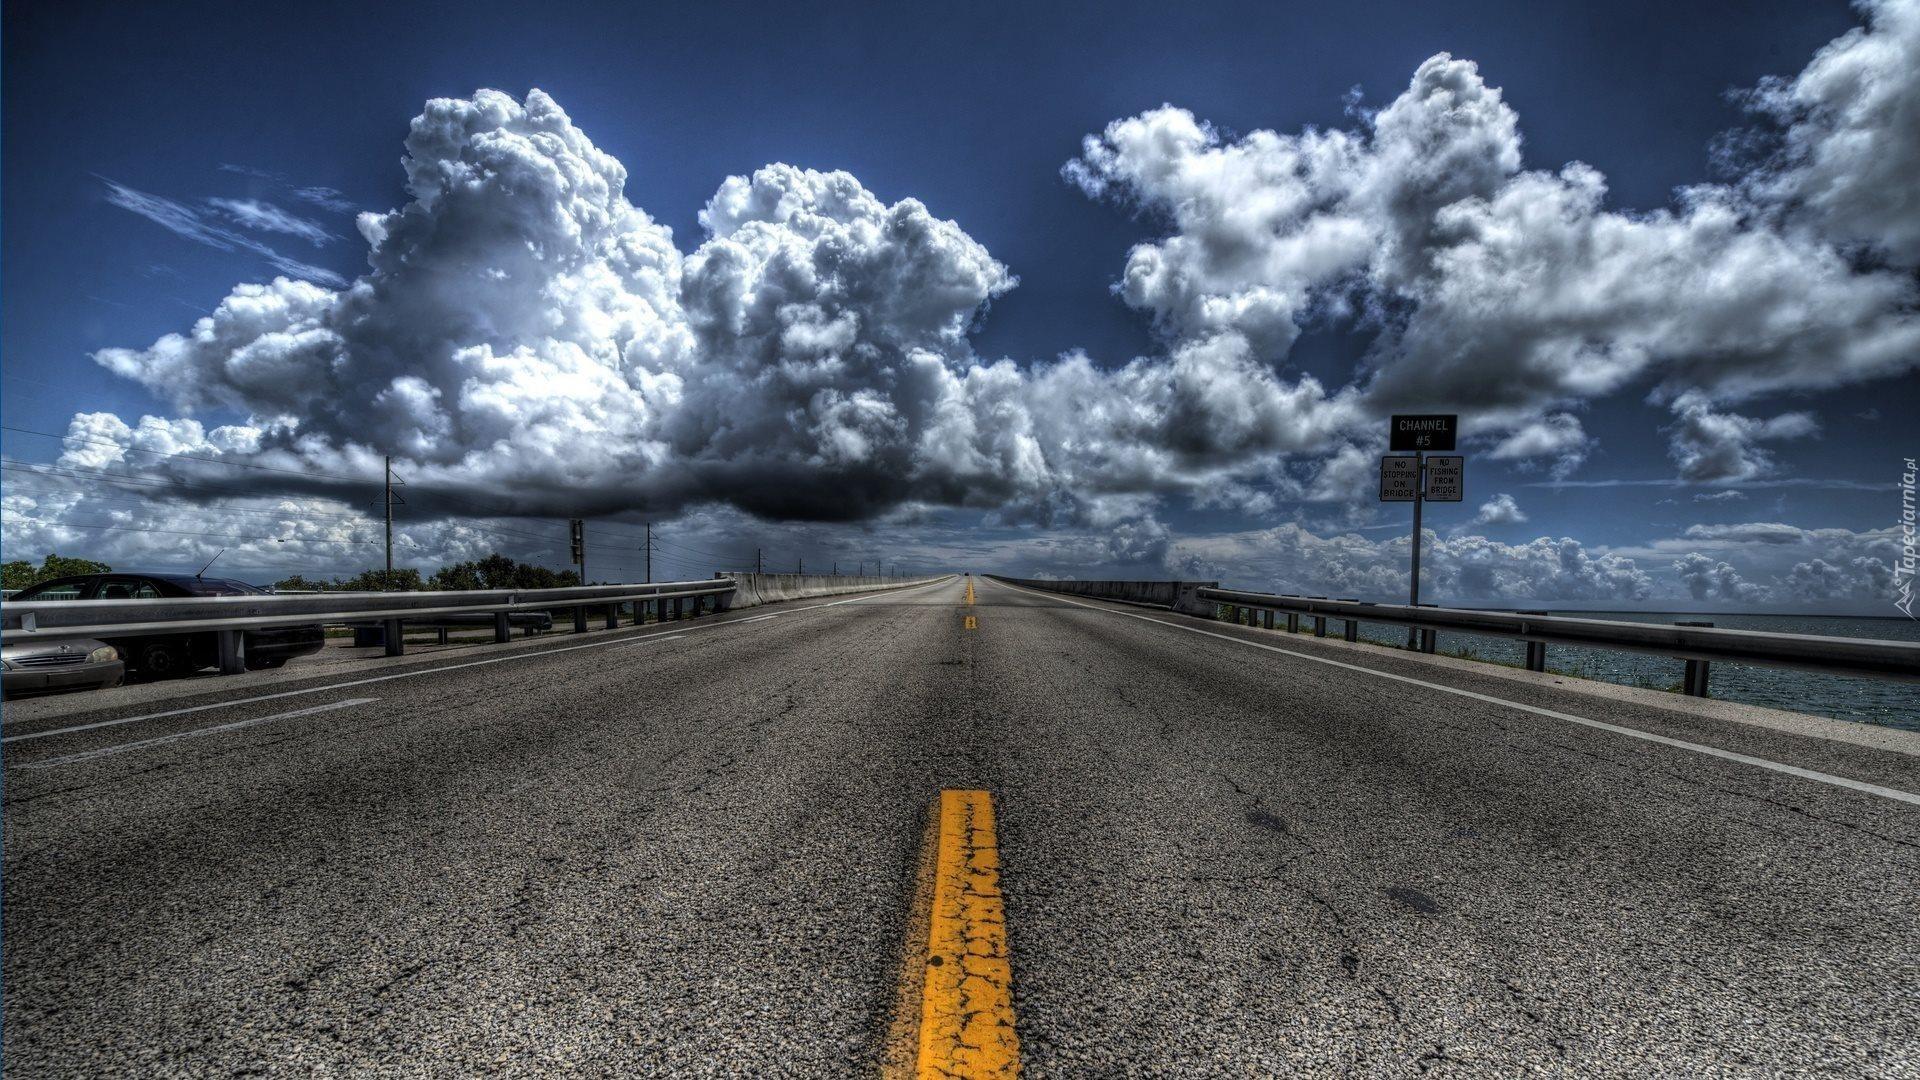 Ulica, Chmury